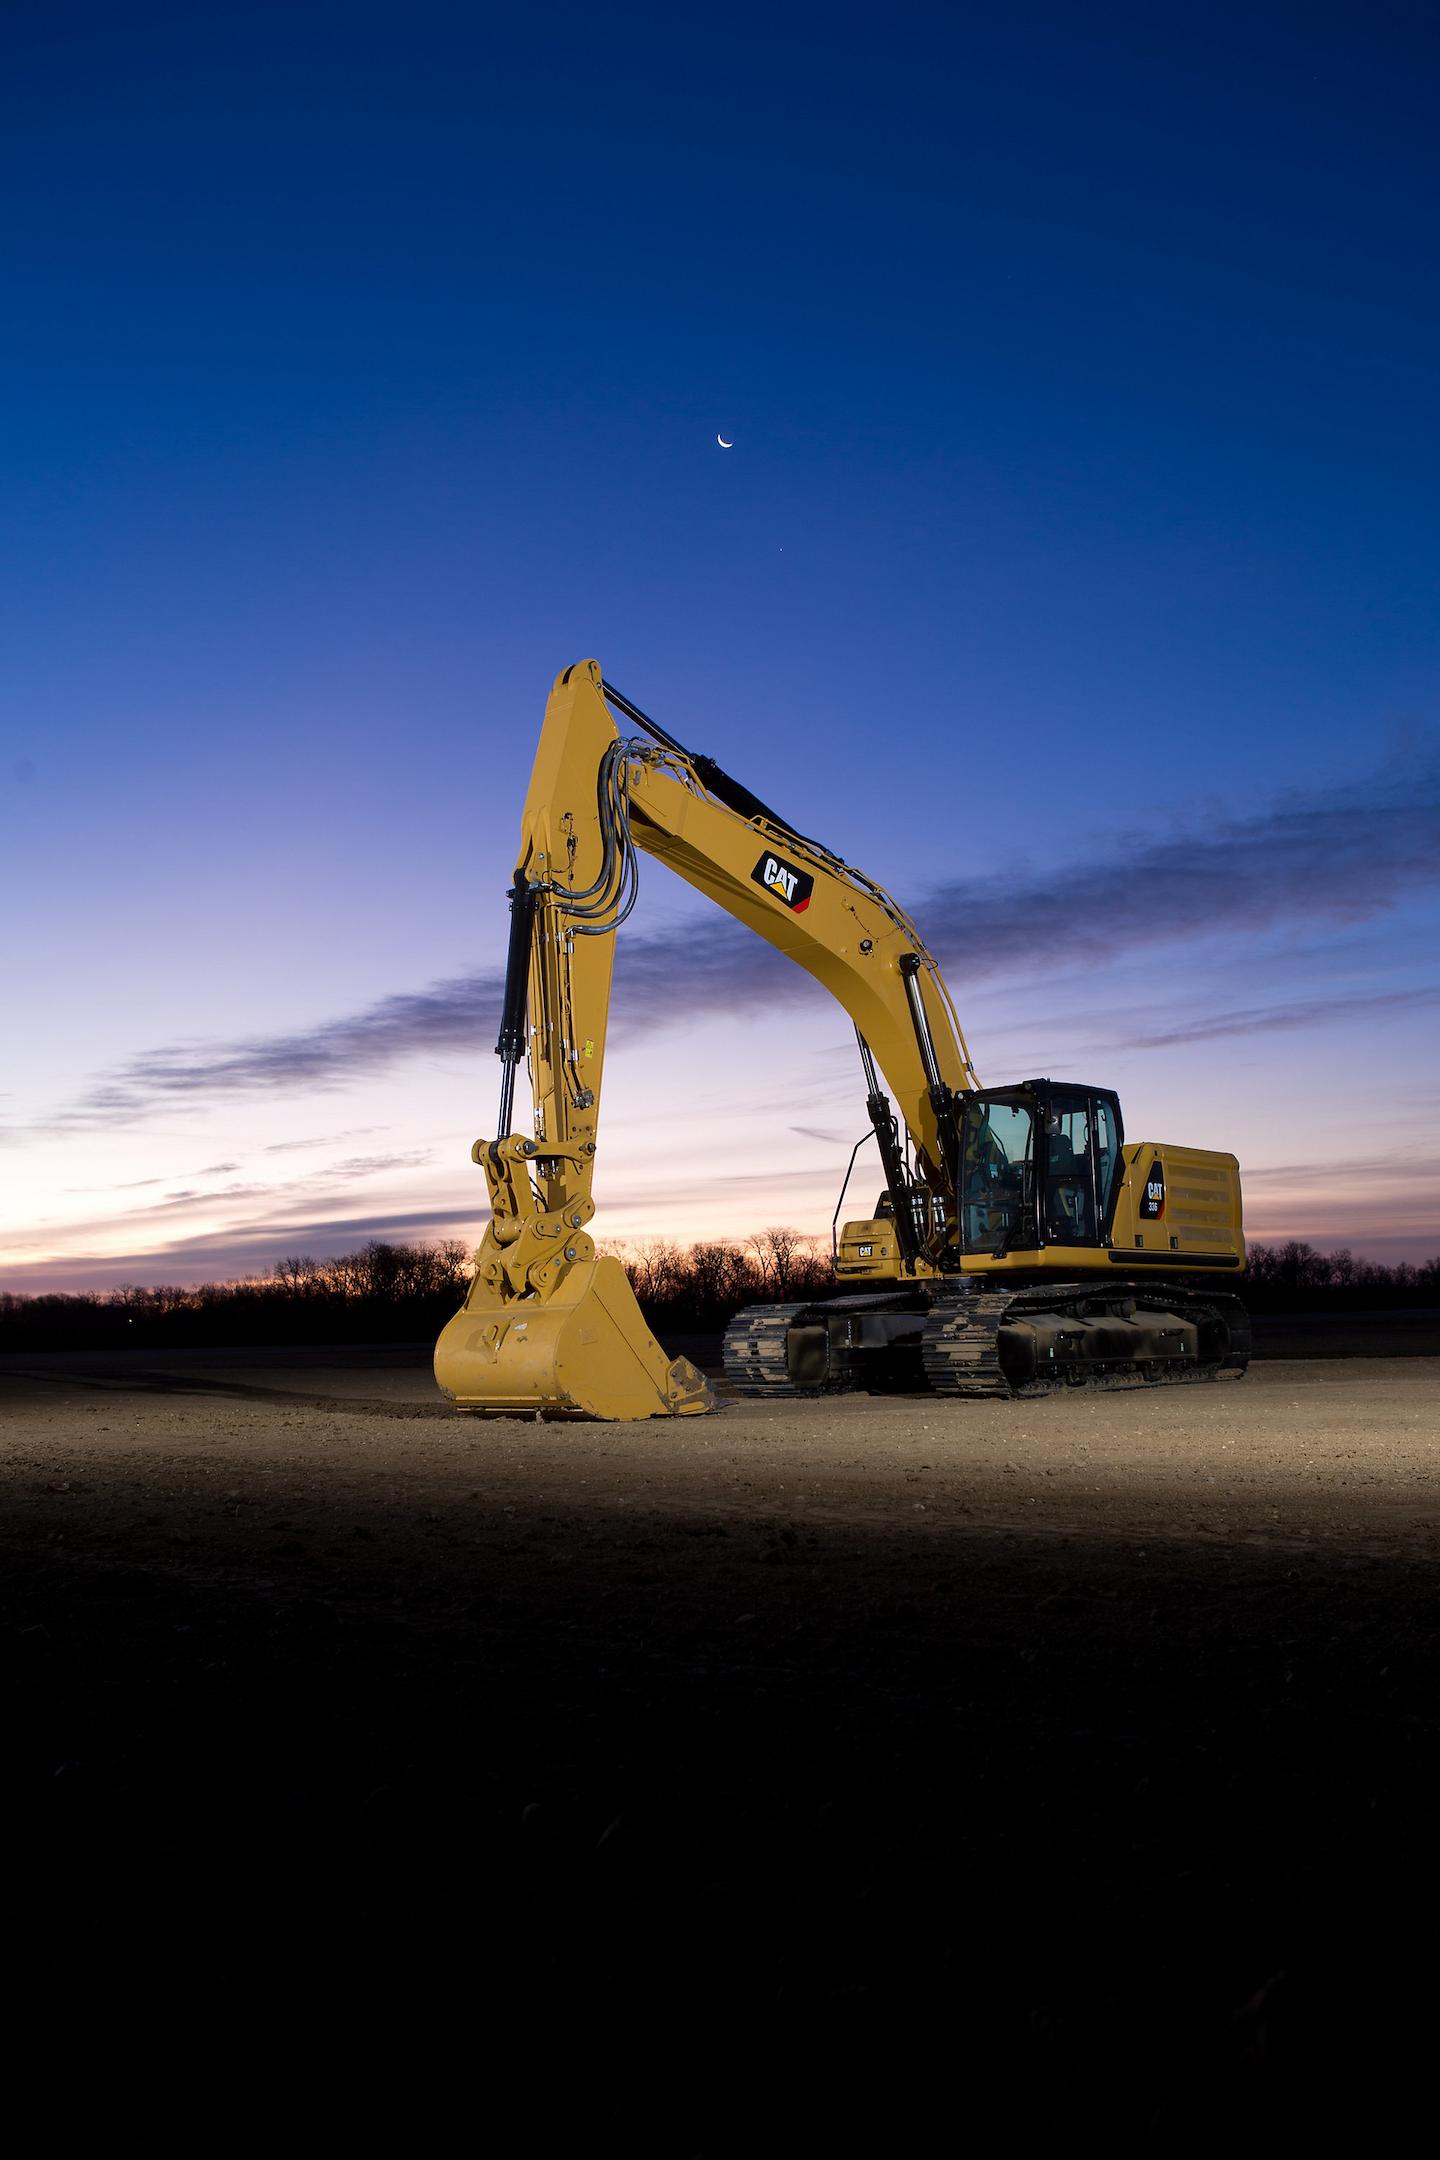 Caterpillar Introducing 20 New Machines At Bauma 2019 Oem Off Highway